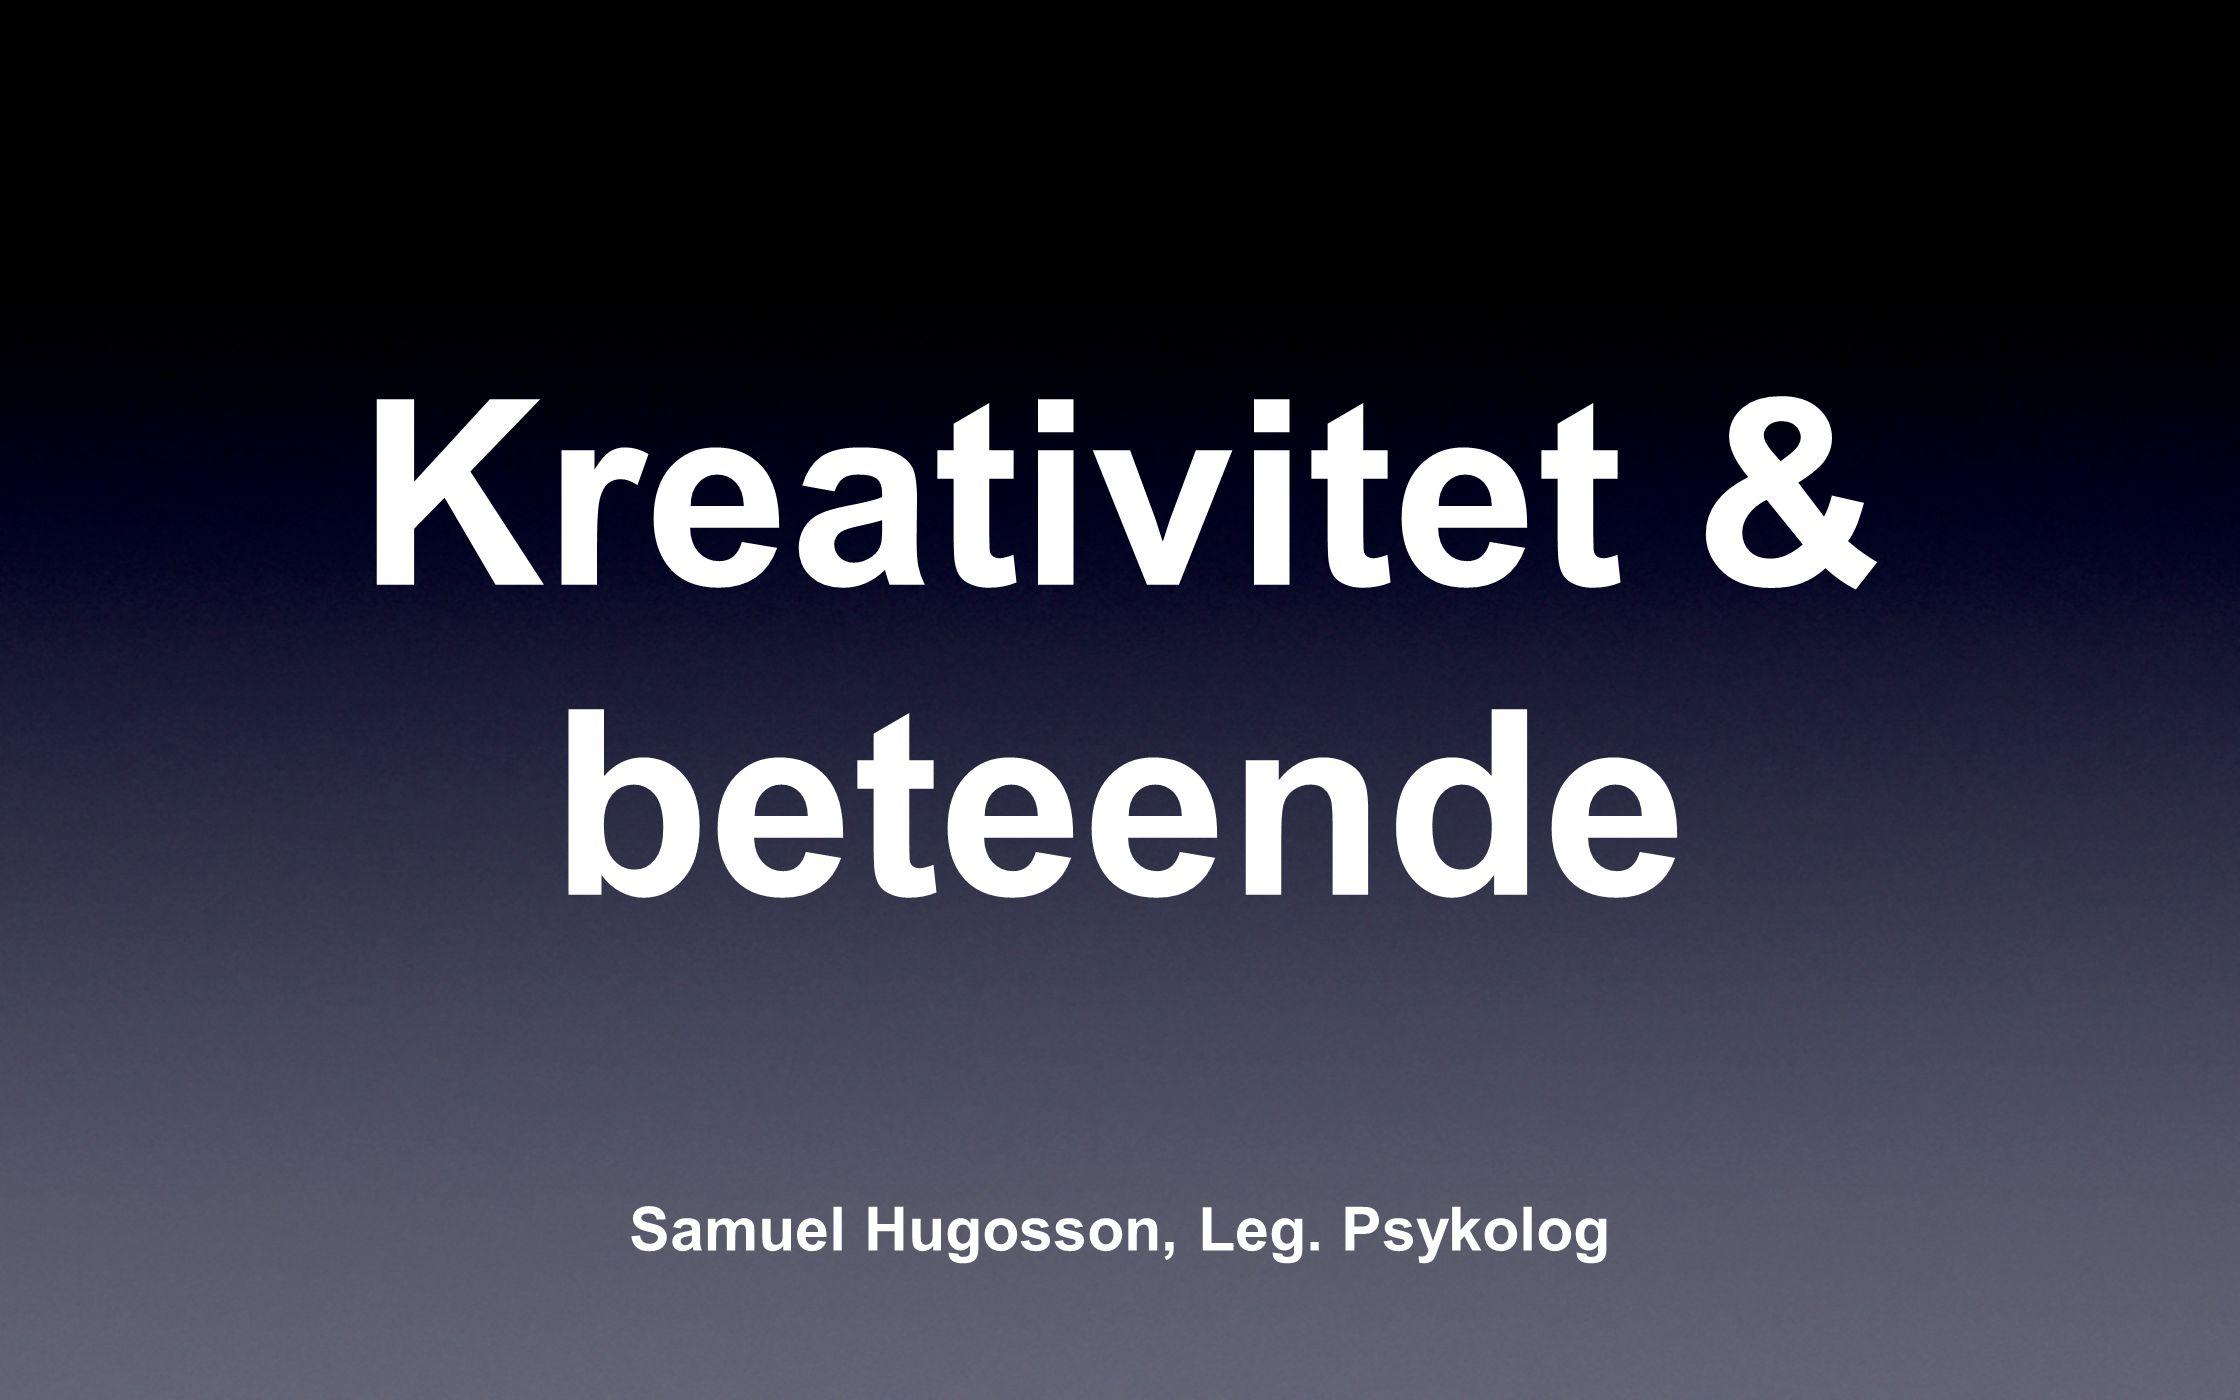 Kreativitet & beteende